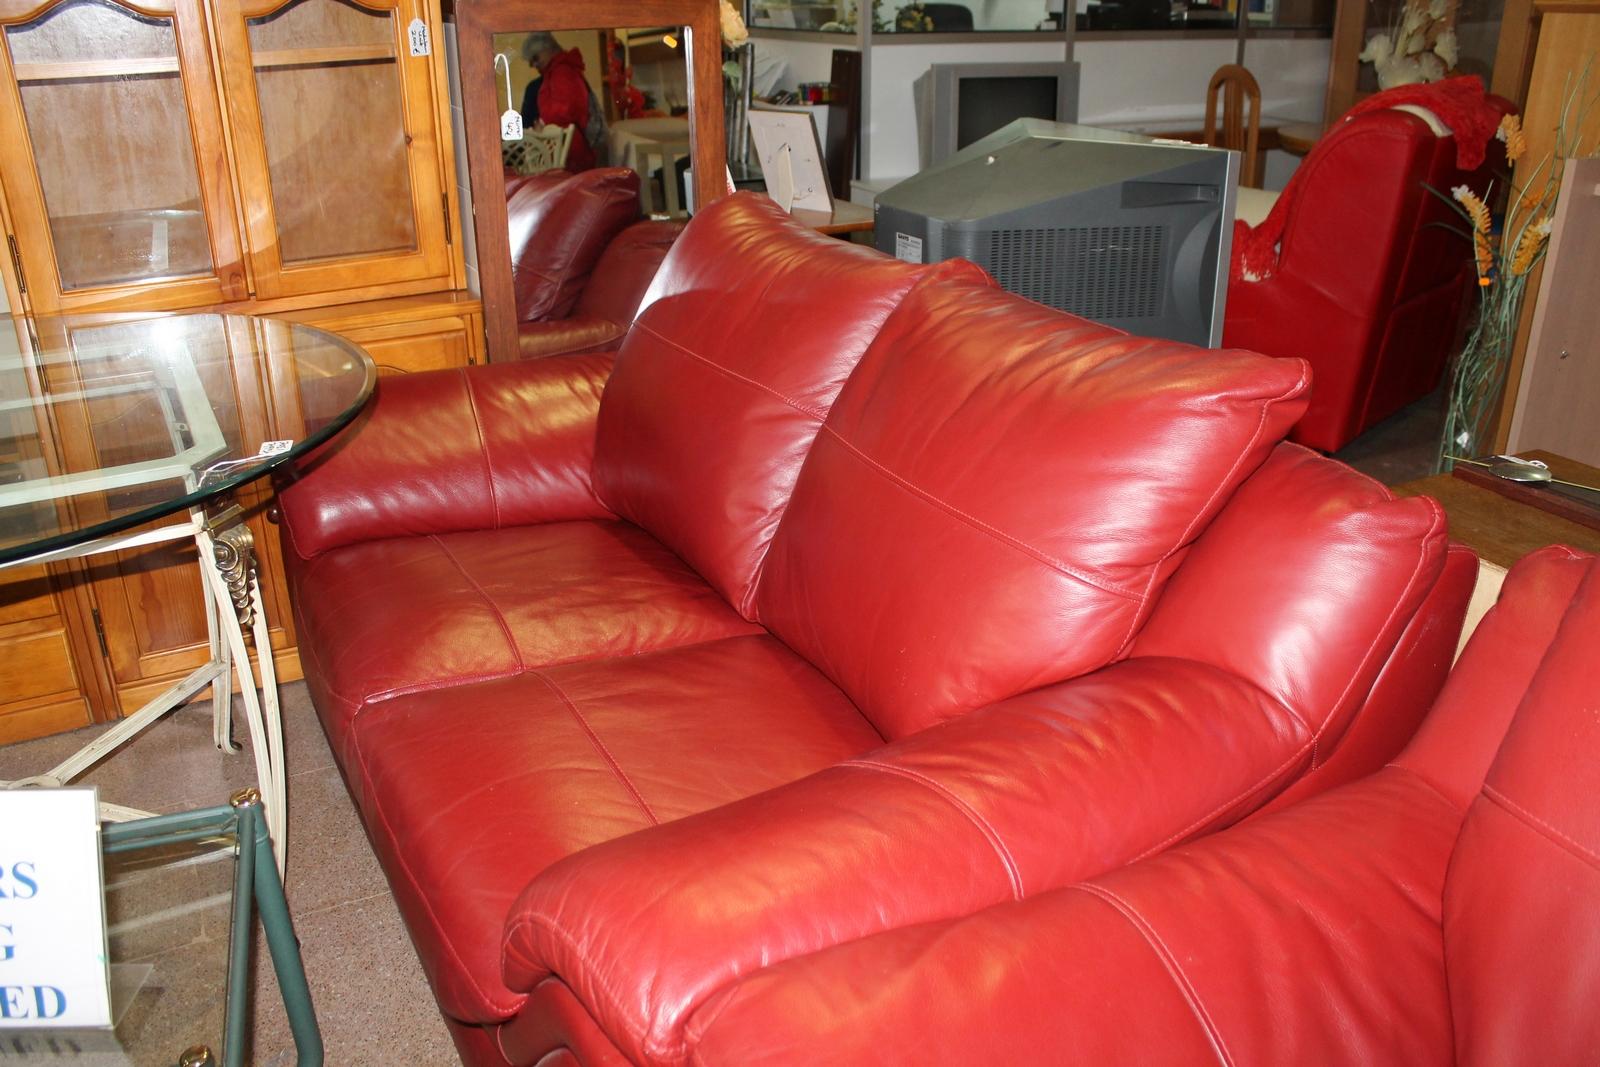 sofa pune olx roche bobois modular mah jong second hand chesterfield thesofa